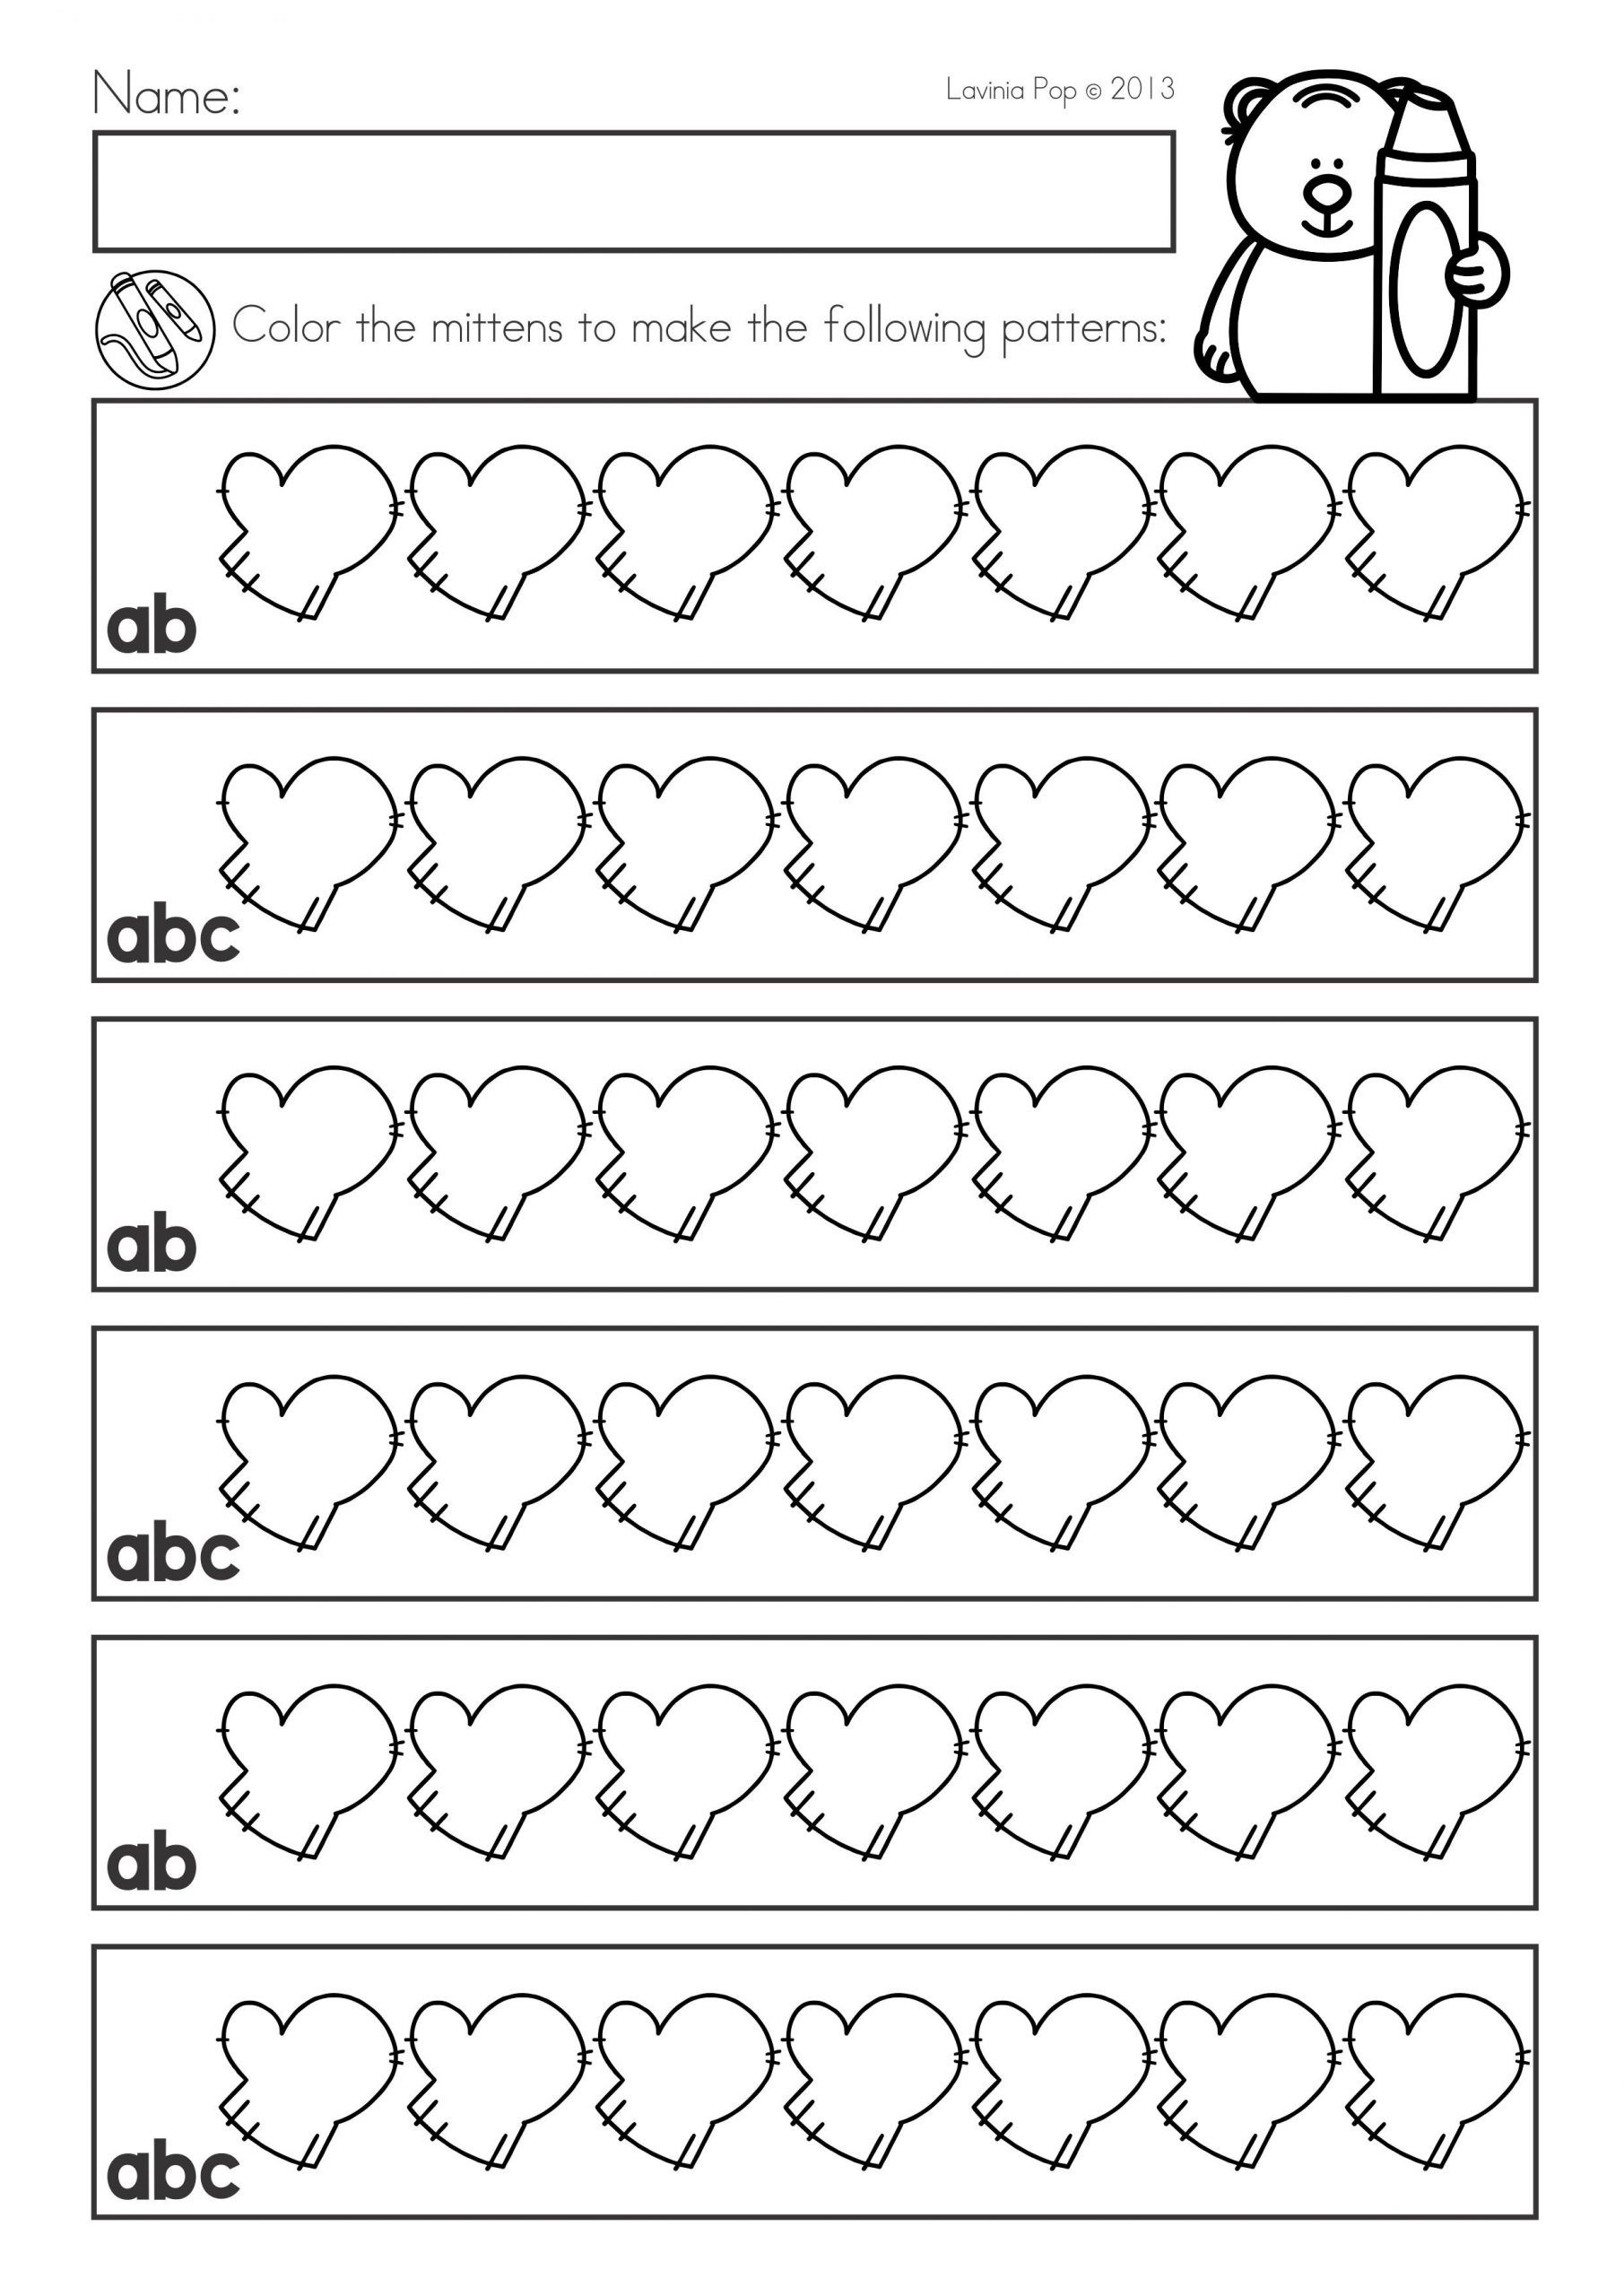 Pattern Worksheets For Kindergarten In